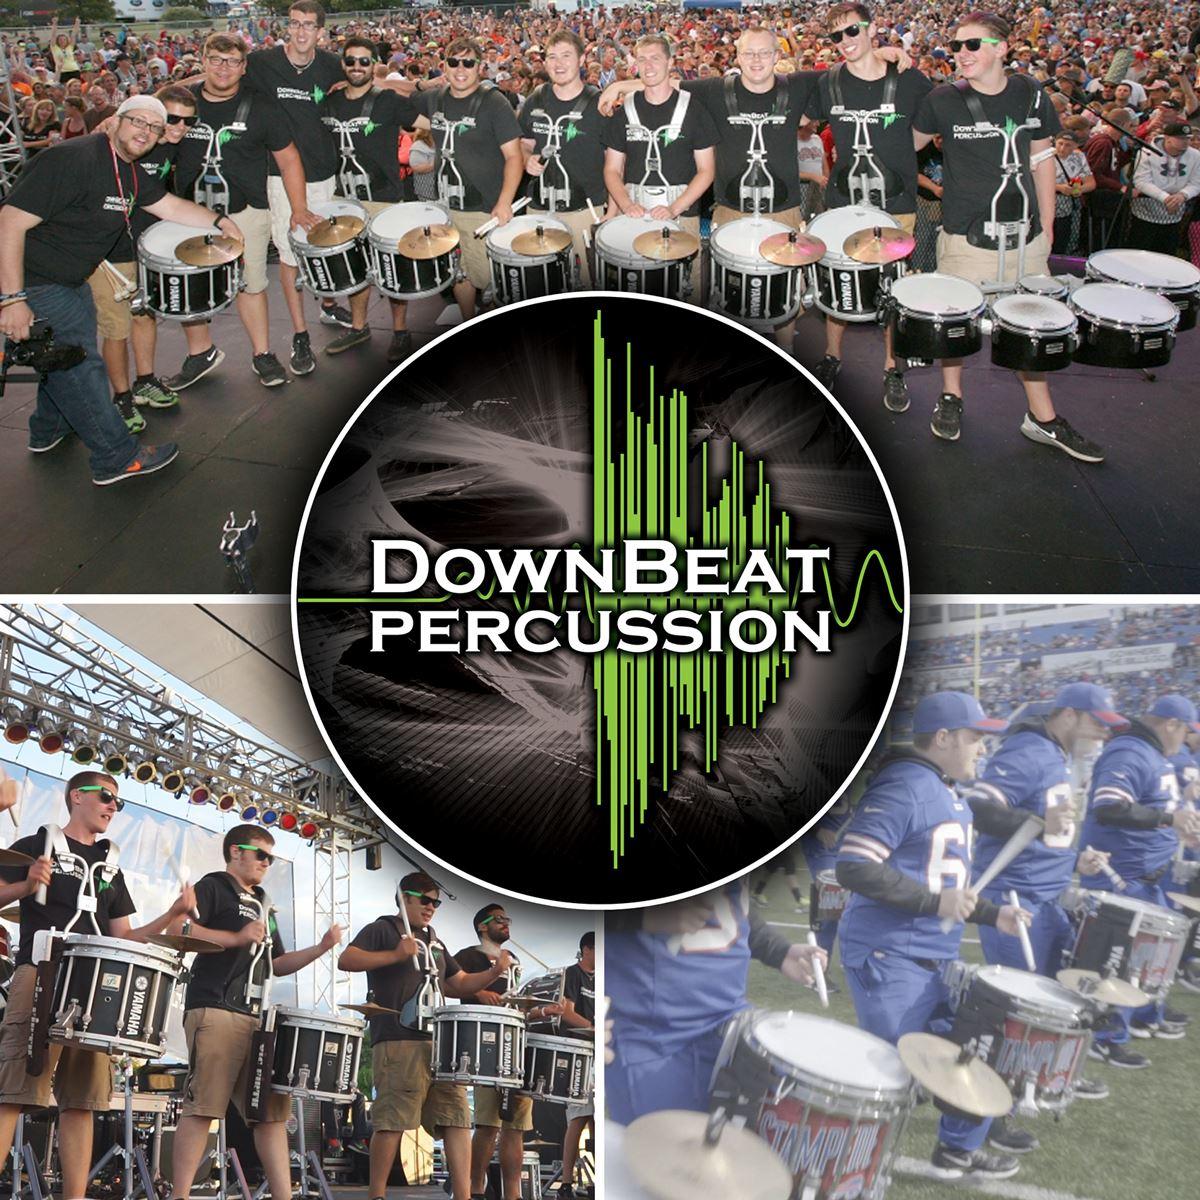 Photo of downbeat percussion